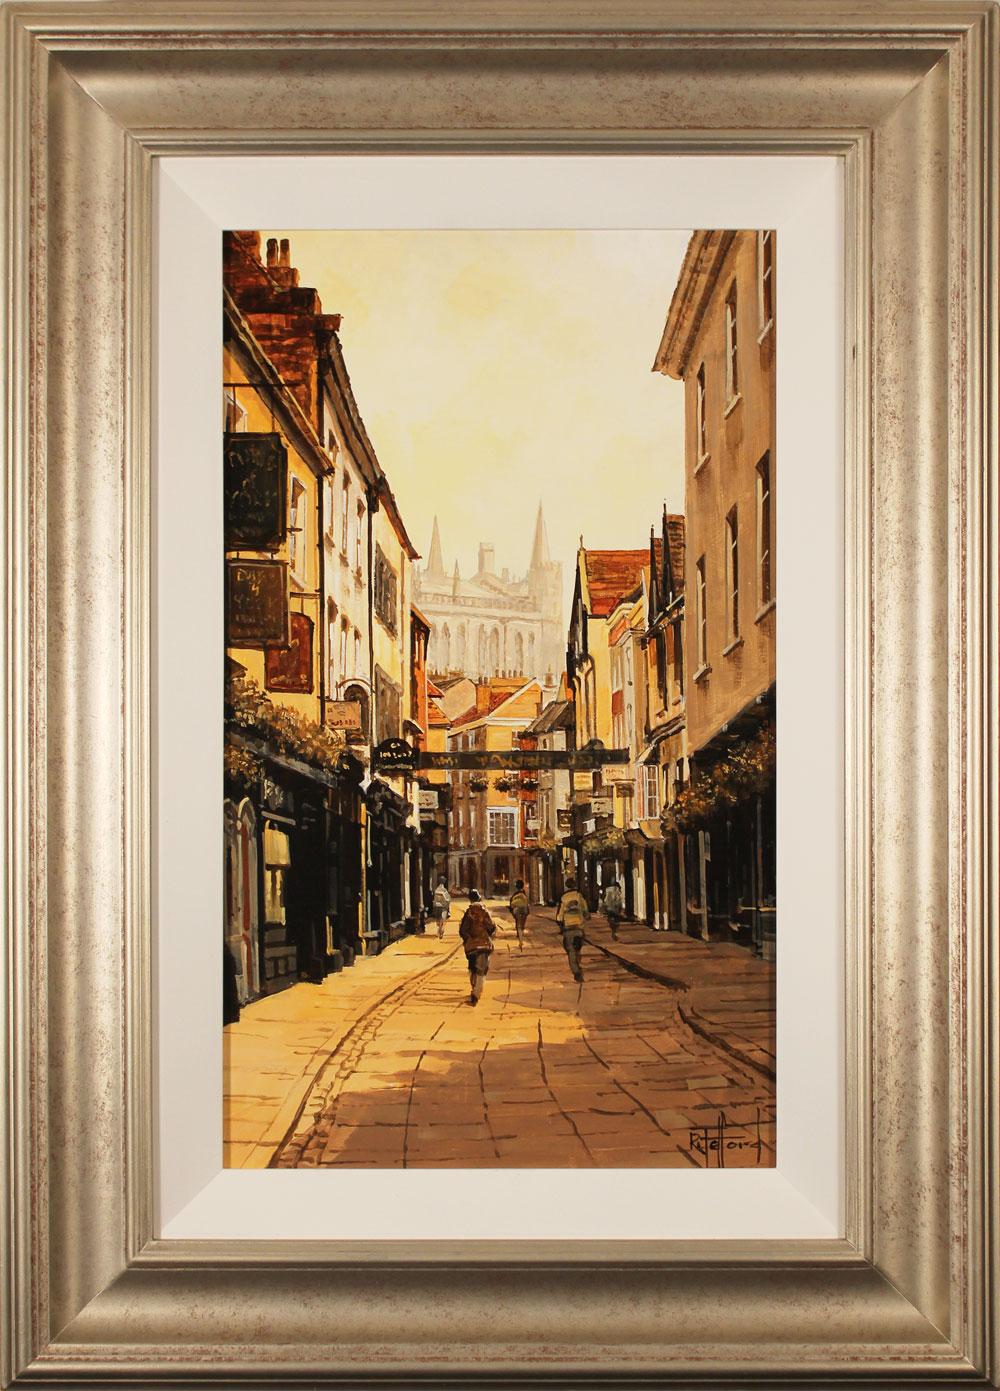 Richard Telford, Original oil painting on panel, Soft Light on Stonegate, York, click to enlarge